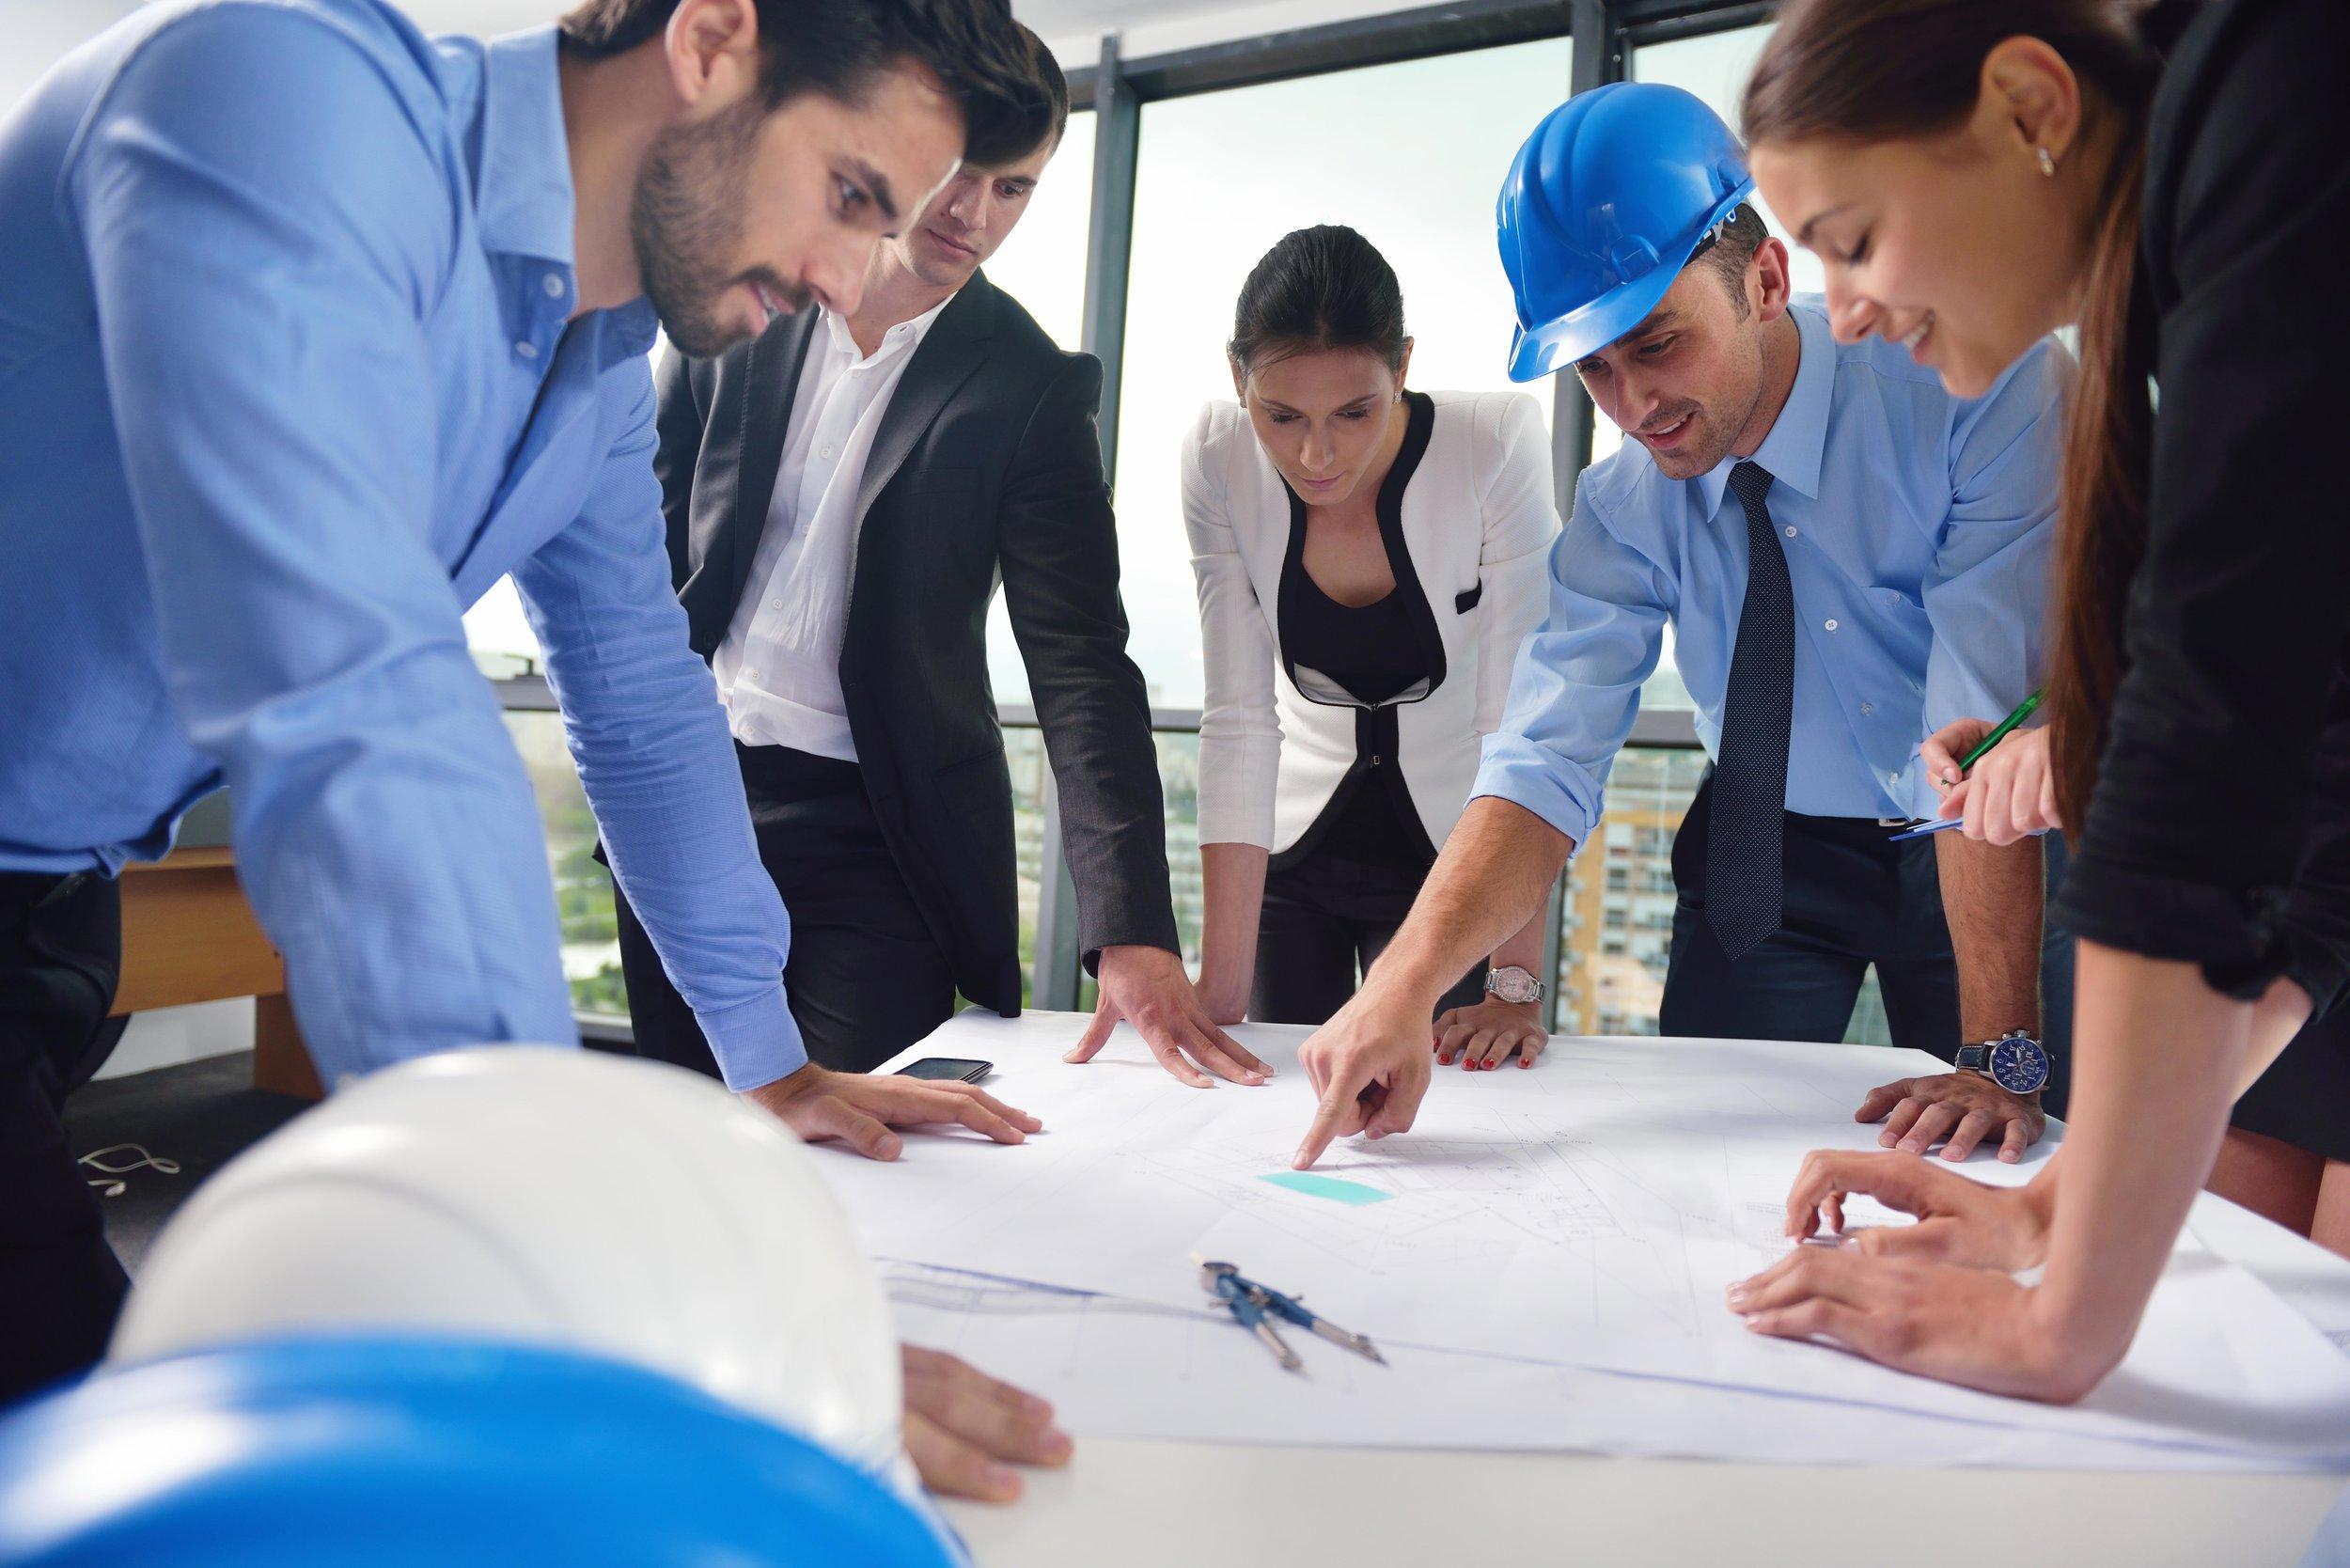 CONSTRUCTION_MEETING.JPG